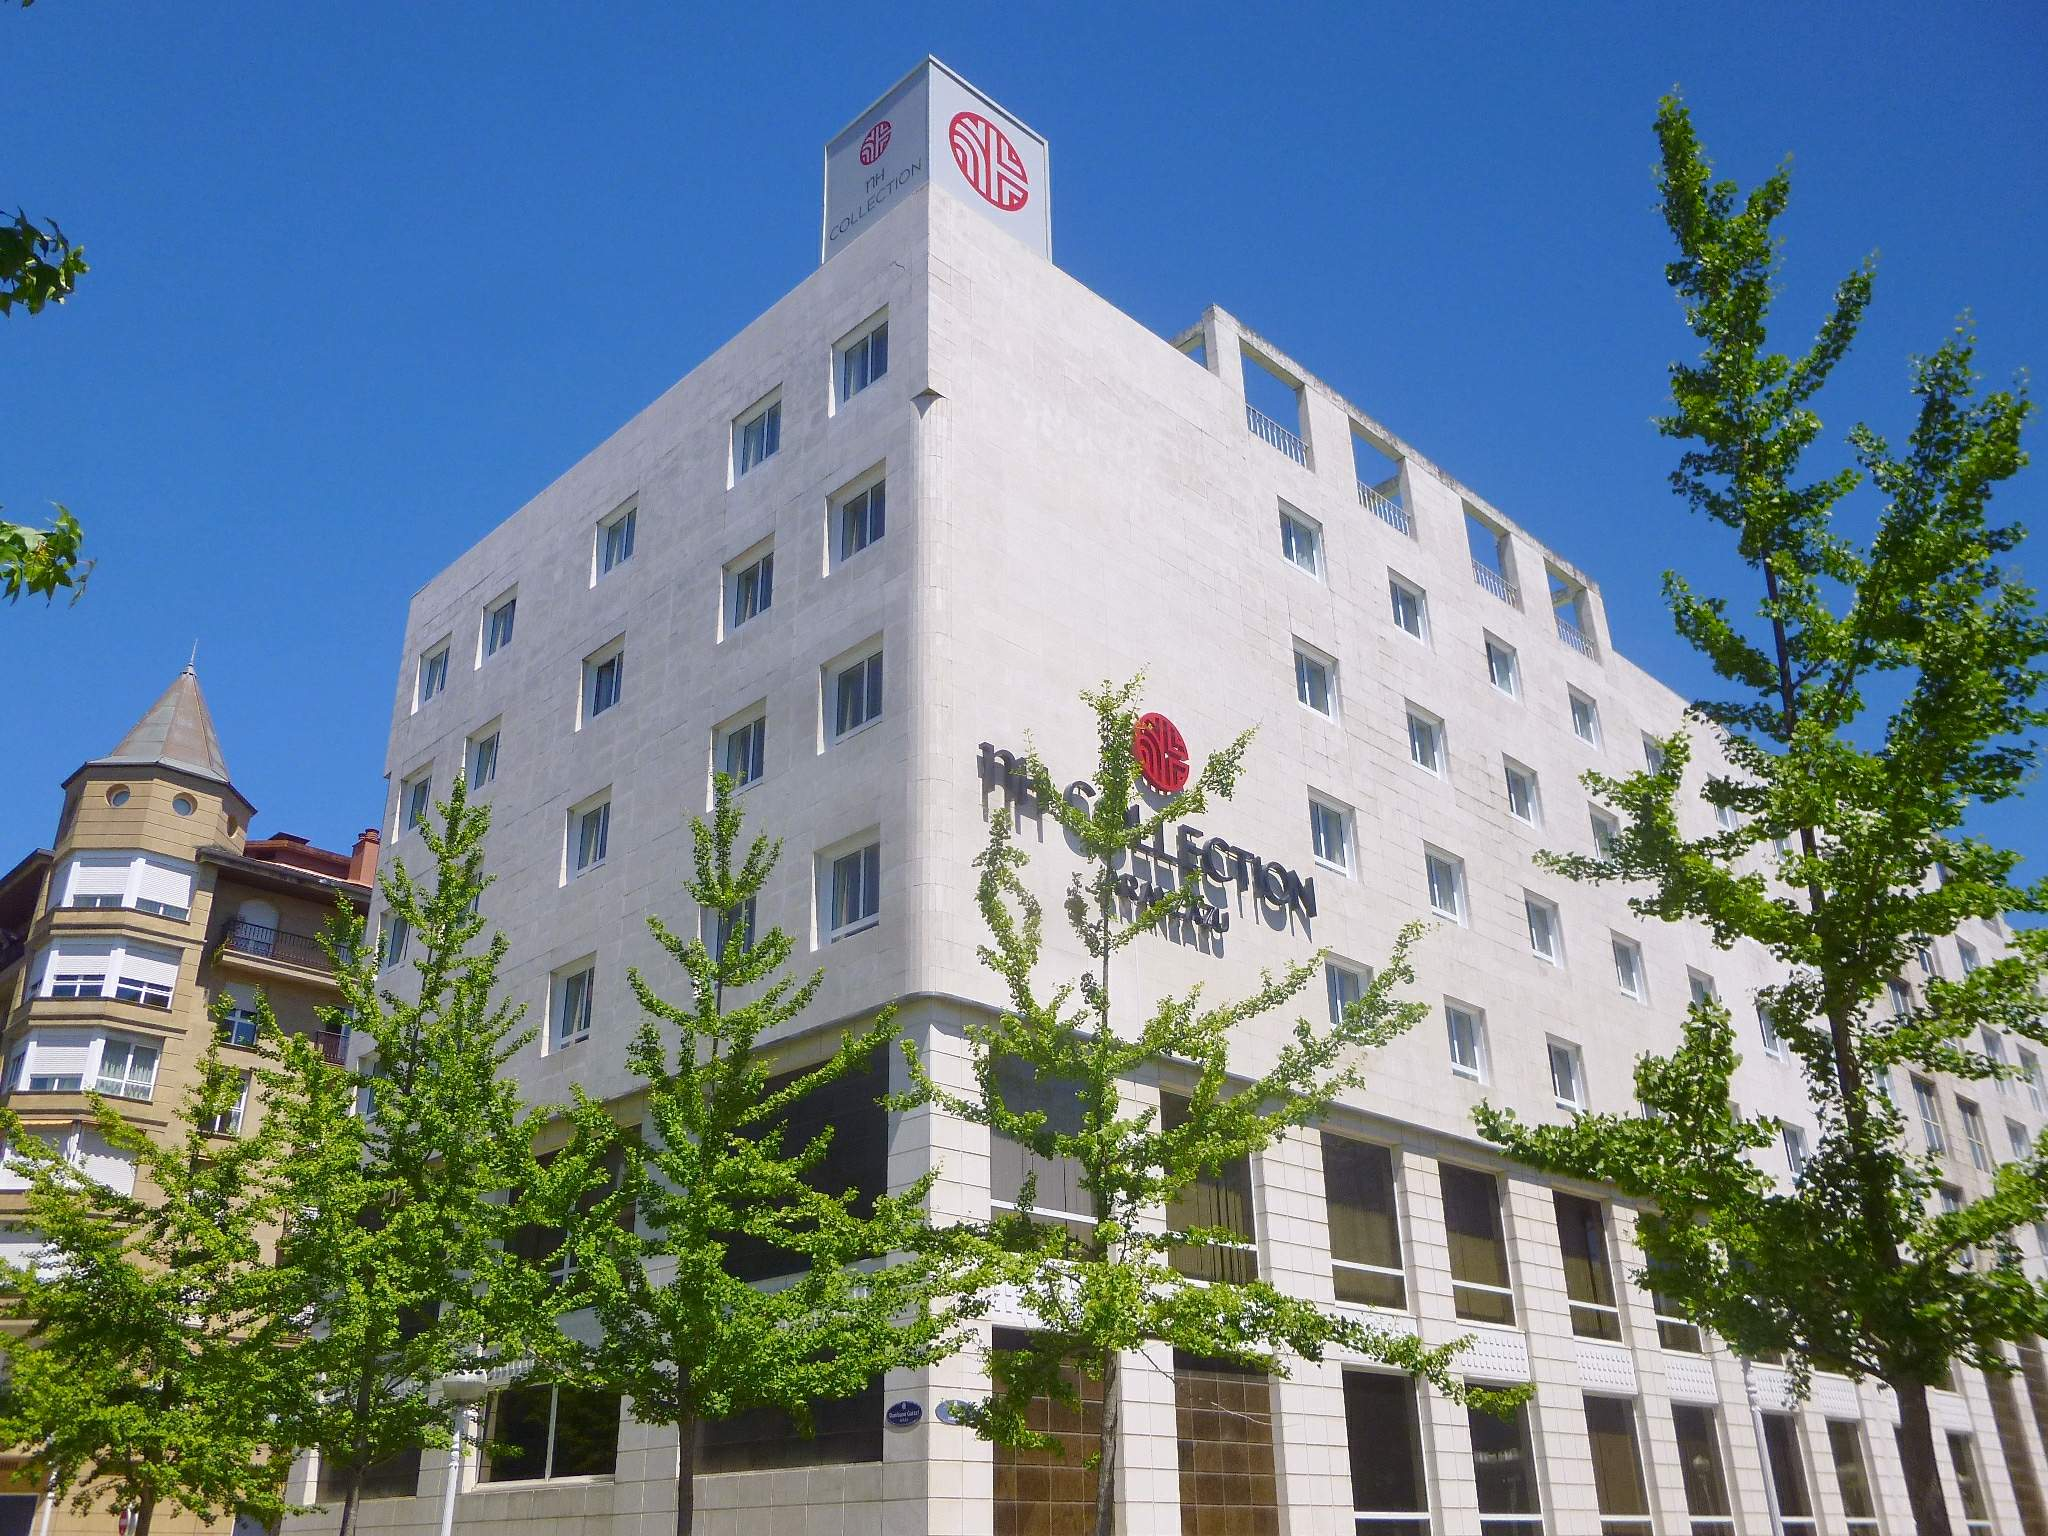 File:San Sebastián - Hotel NH Collection San Sebastián Aránzazu 1.jpg -  Wikimedia Commons